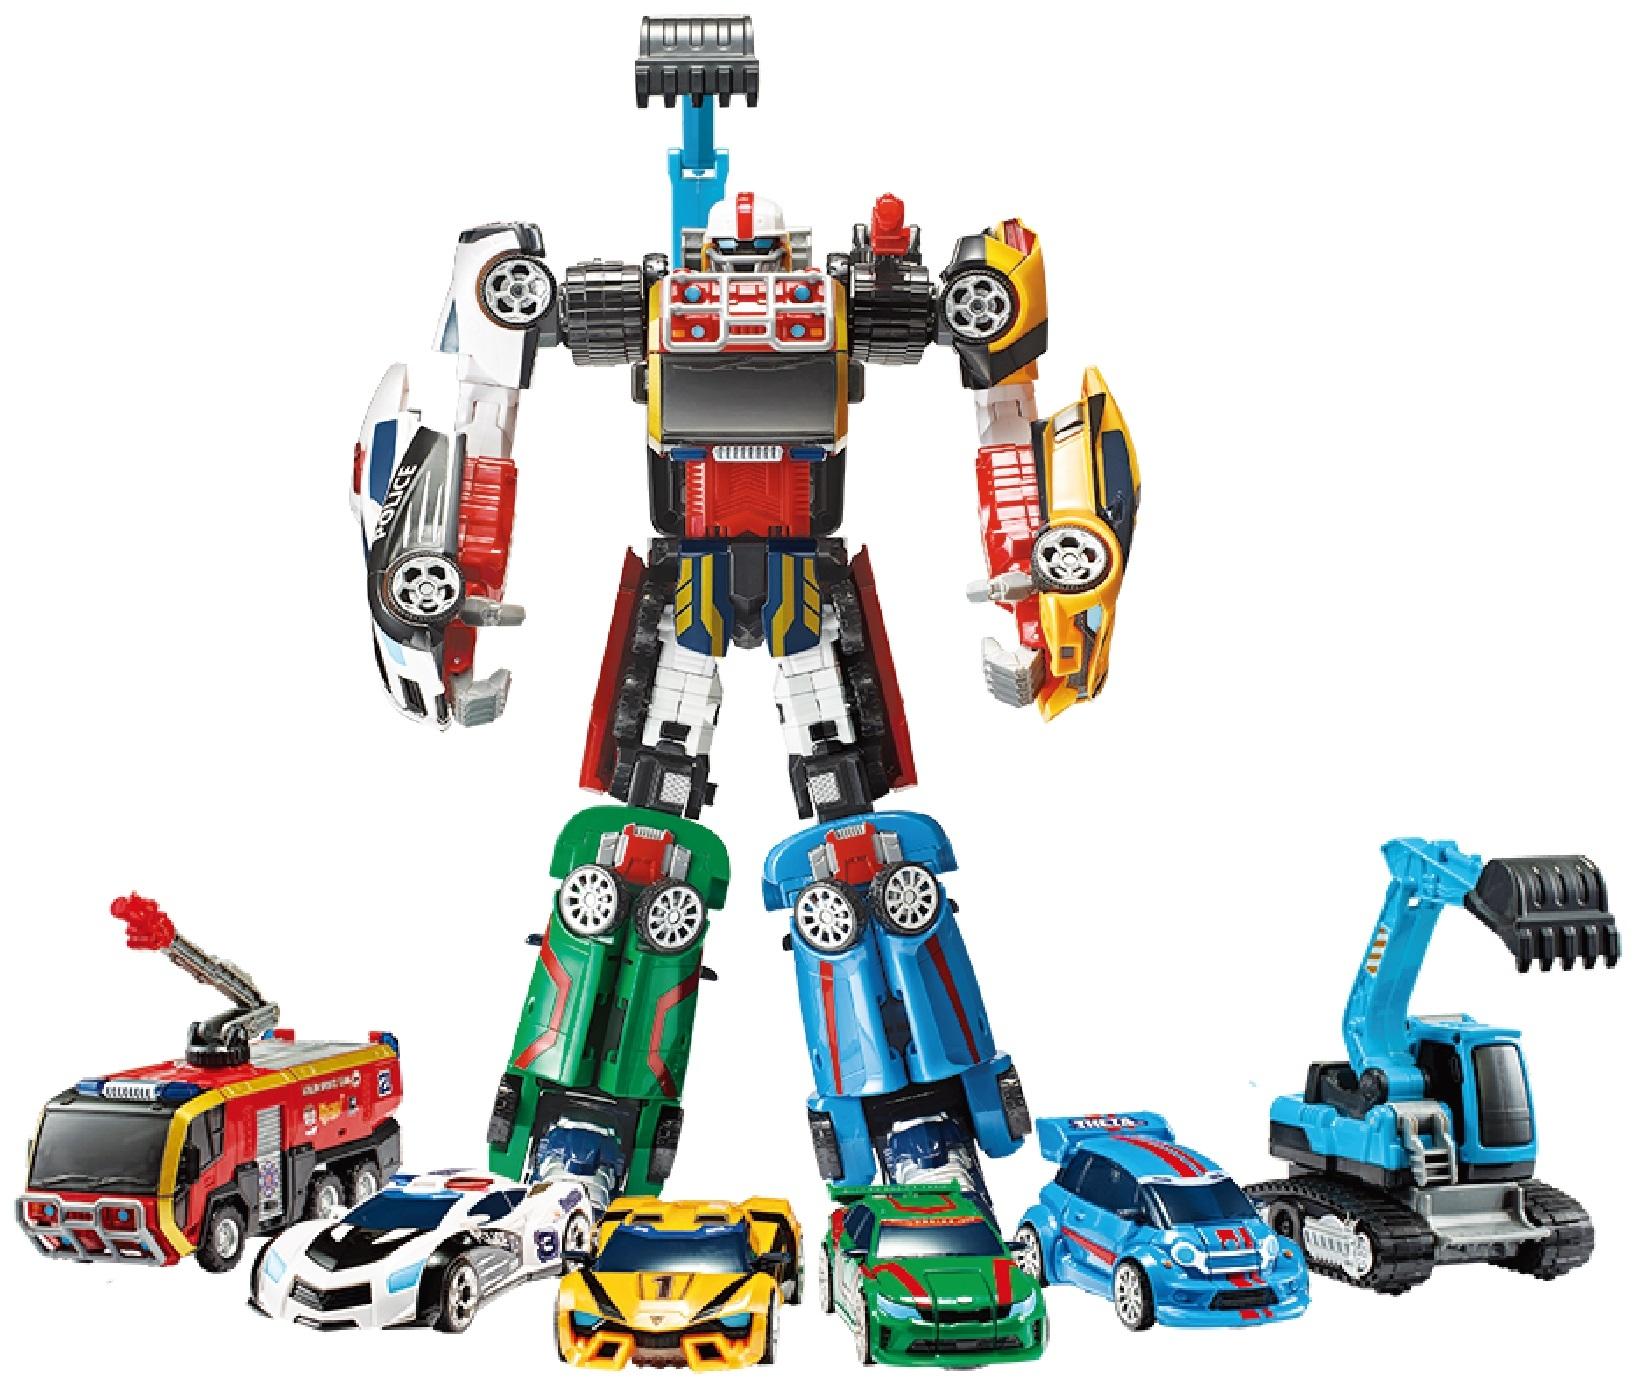 робот-трансформер Tobot Атлон Магма 6 S2 цена